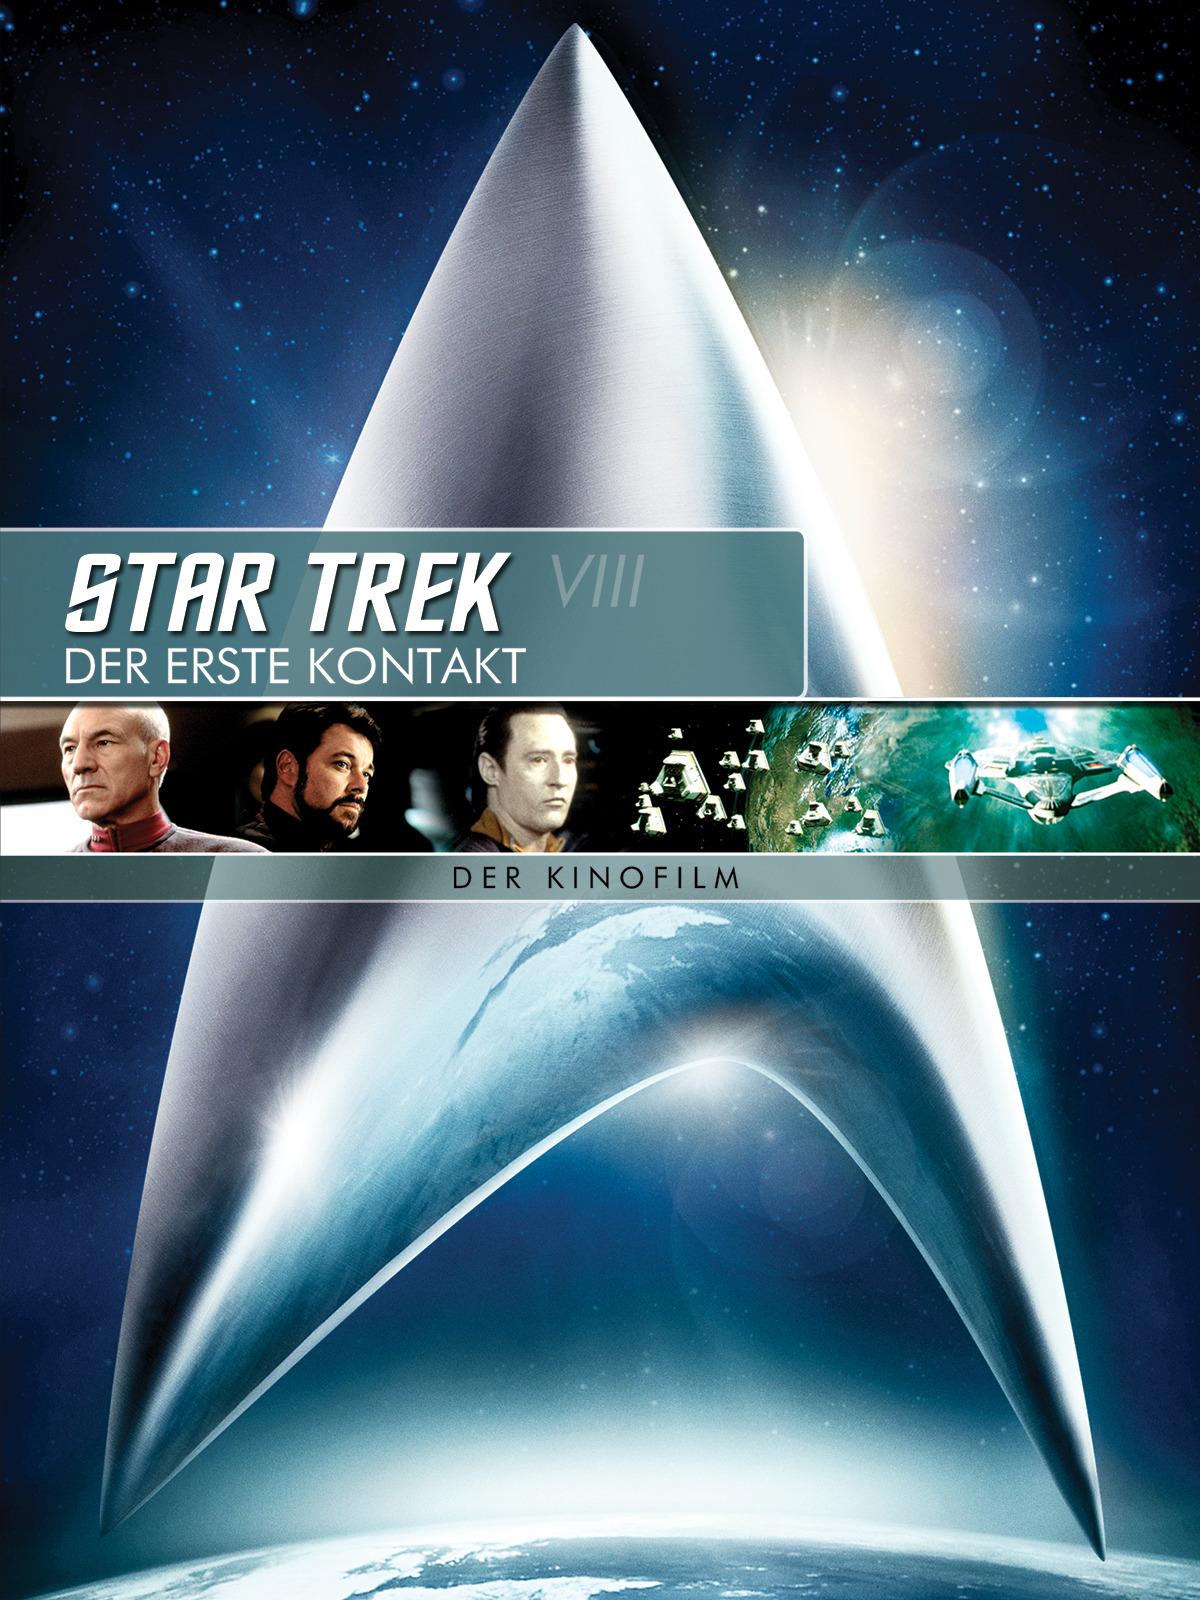 Star Trek VIII: Der erste Kontakt